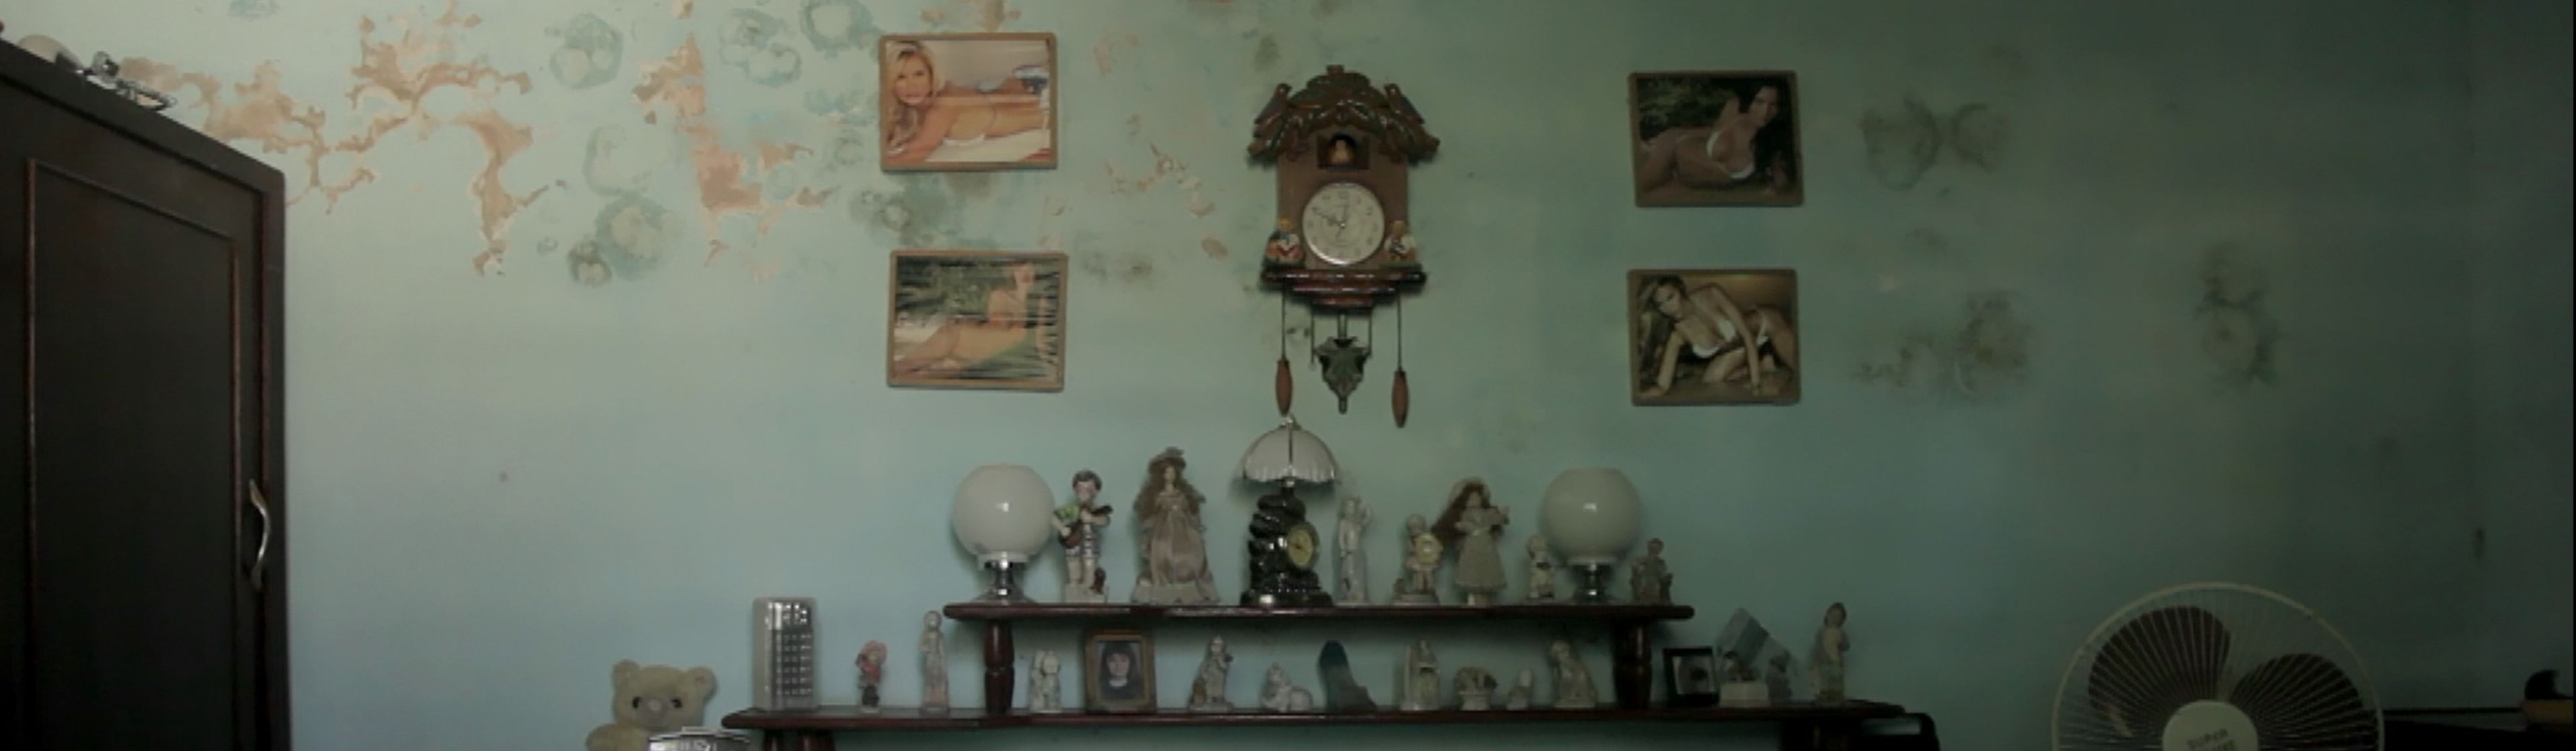 HOUSE FOR SALE / CASA EN VENTA